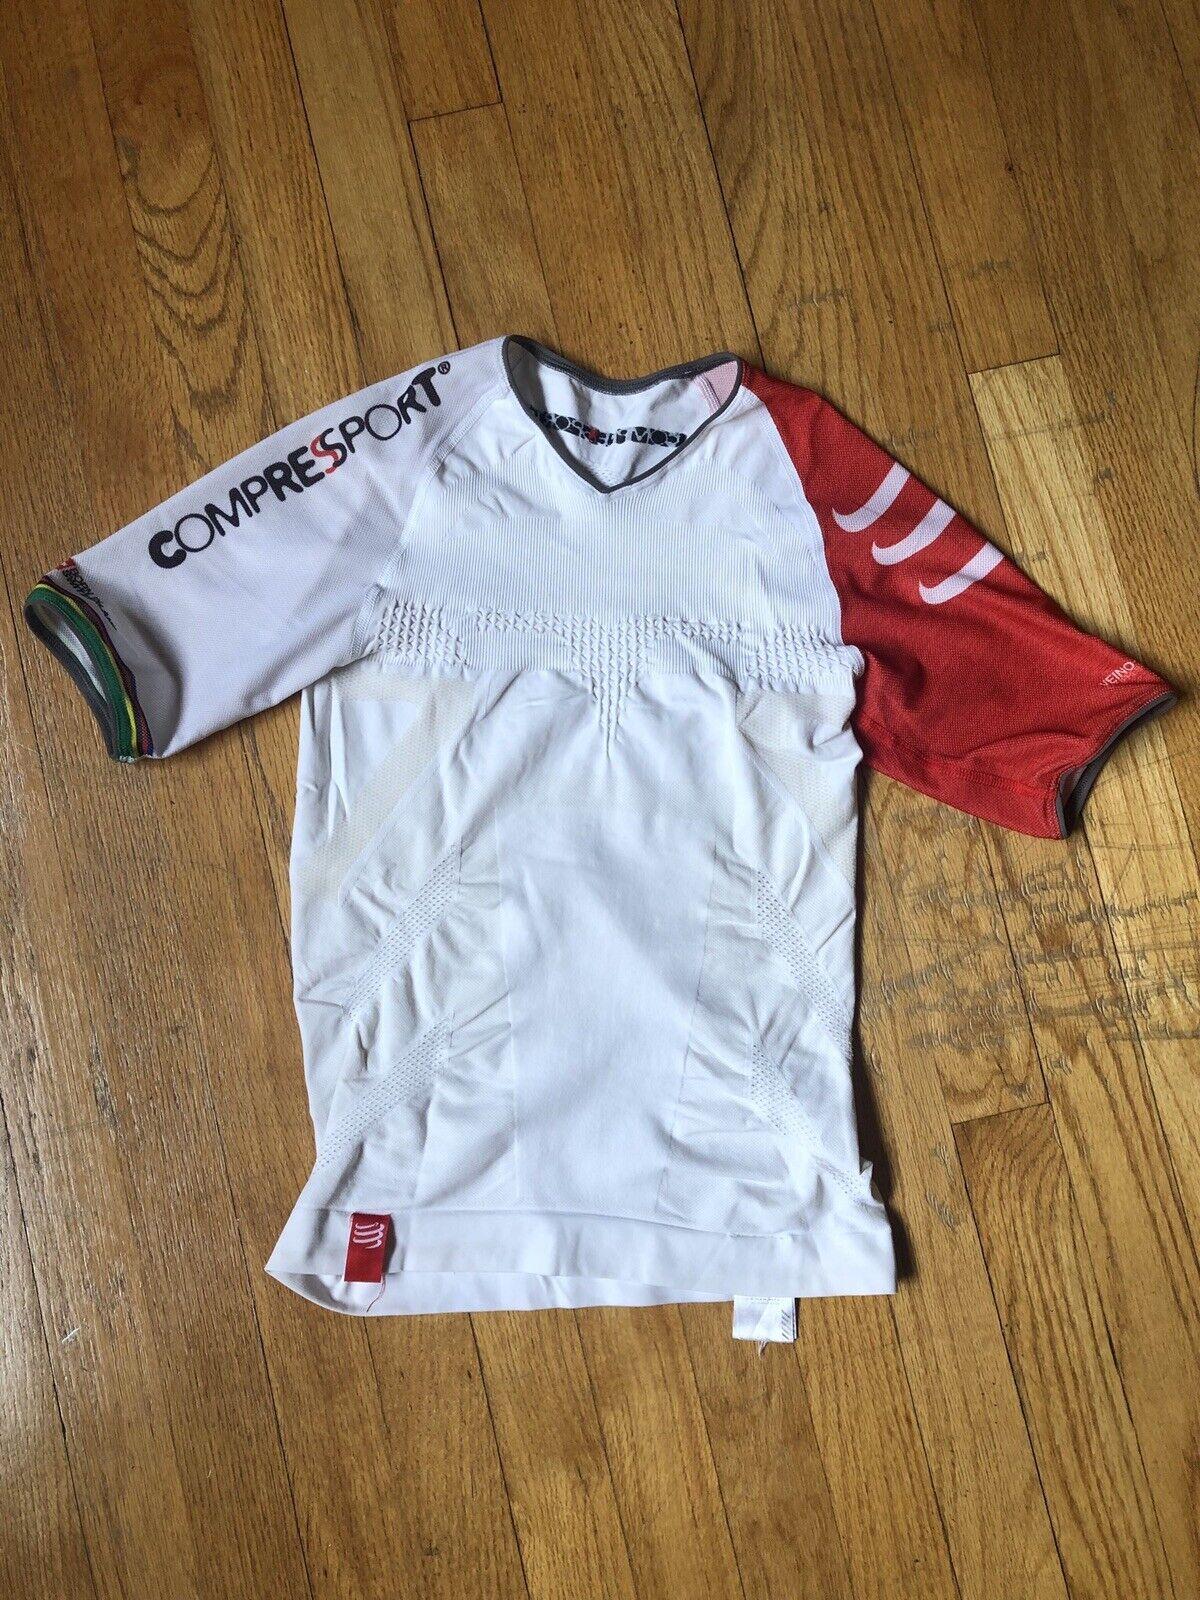 Compressport  Men's Triathlon Short Sleeve Shirt White Small  luxury brand